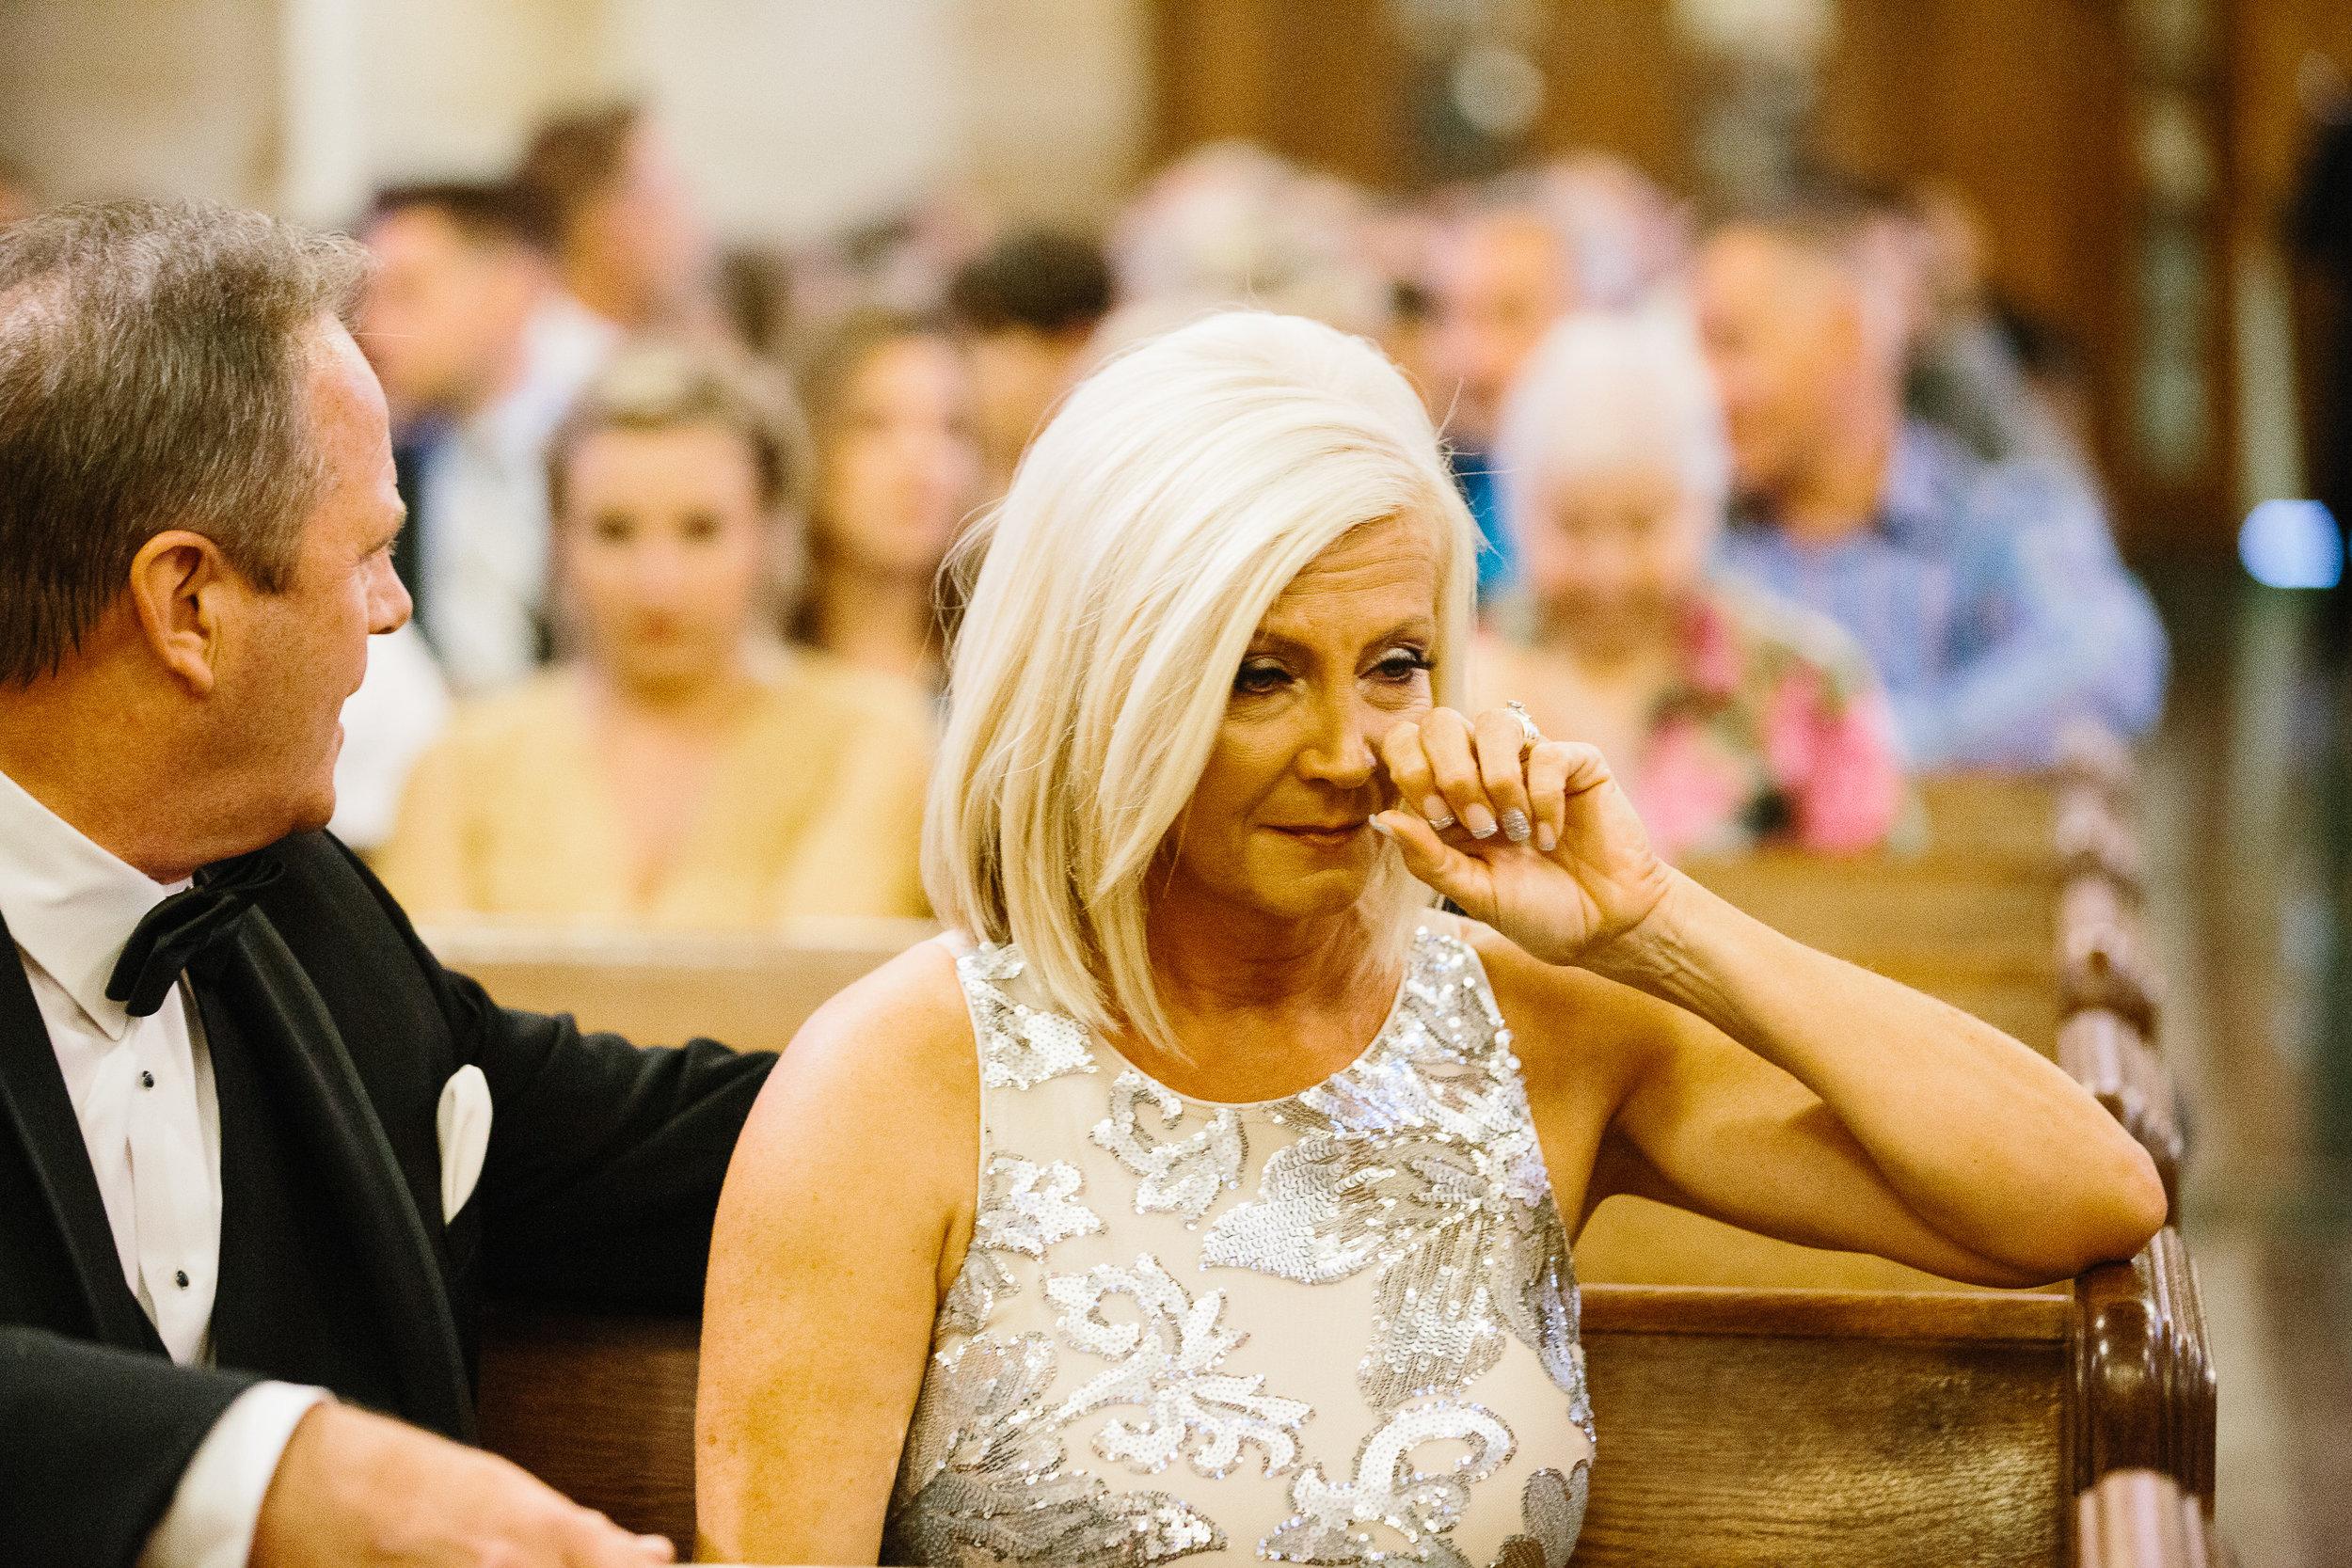 0166_20170819 Randi and Chance Wedding.jpg